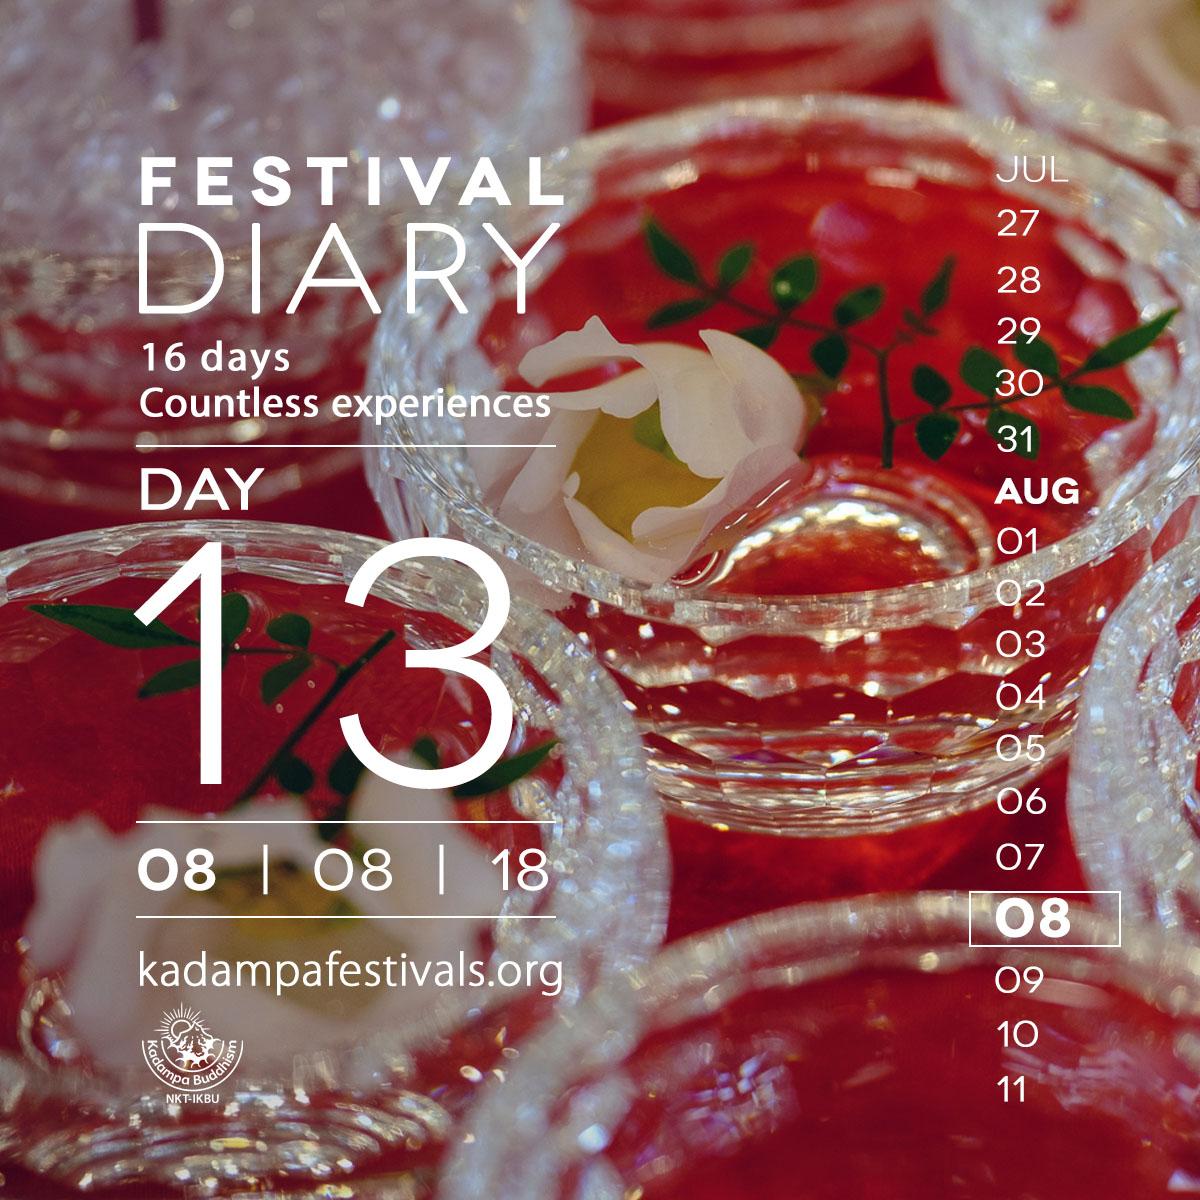 2018-07-26-festival diary-13-m